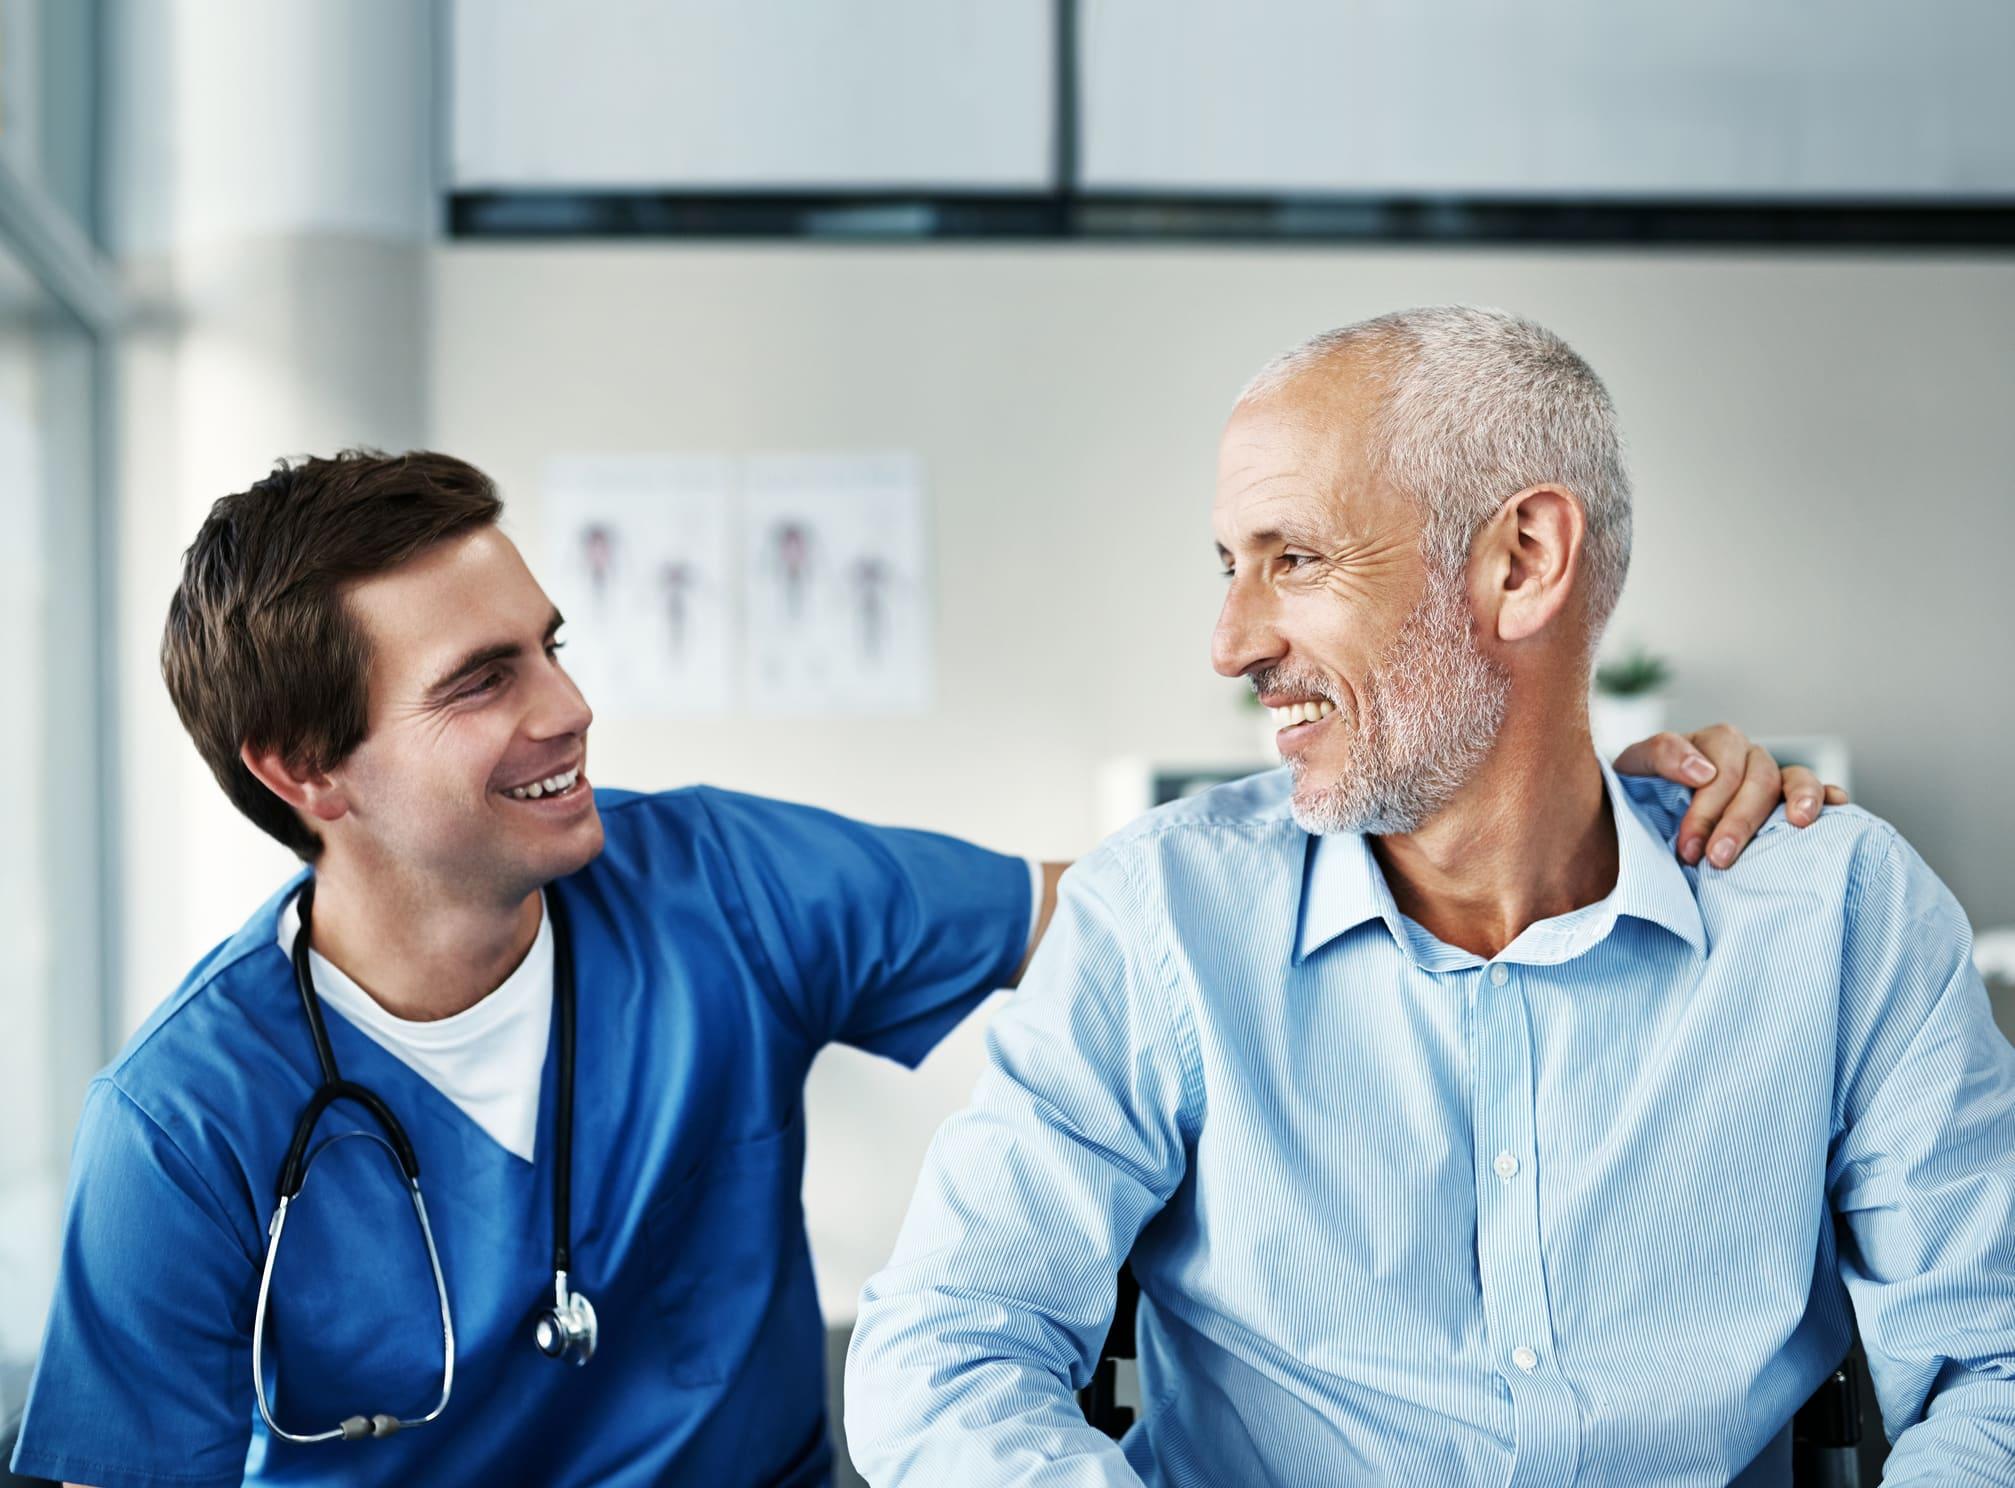 a male nurse attending an old man patient